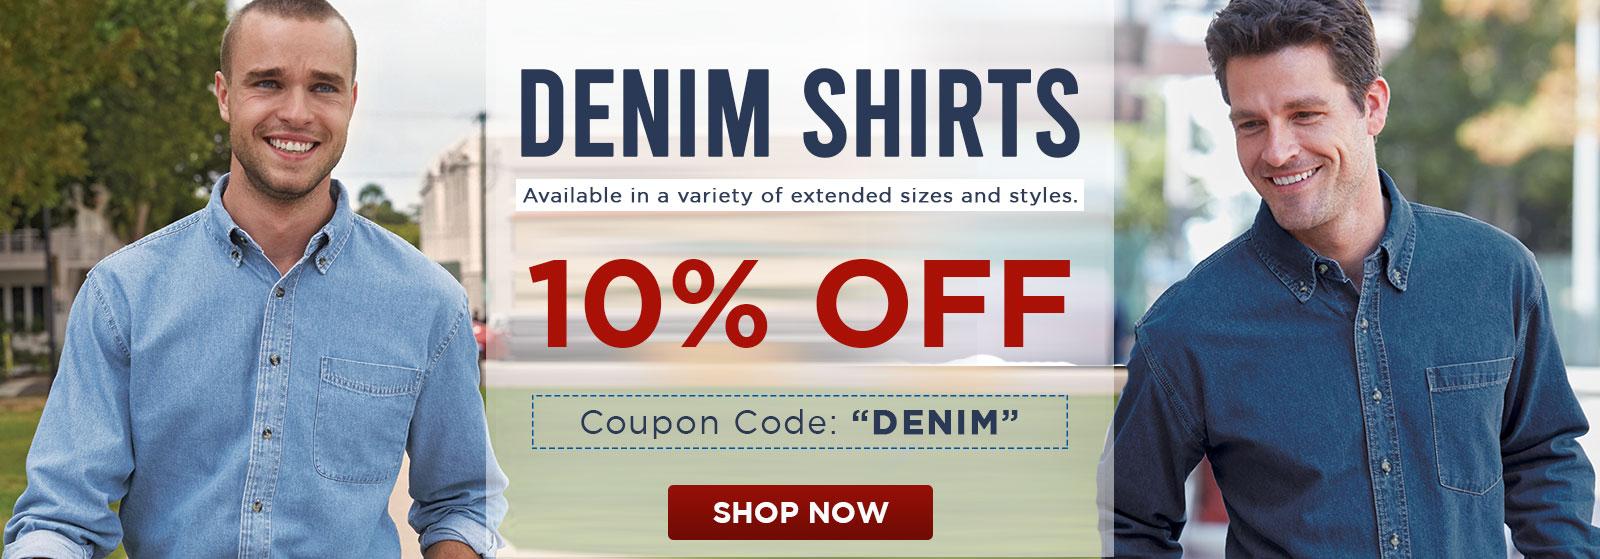 bnt-denim-shirt.jpg